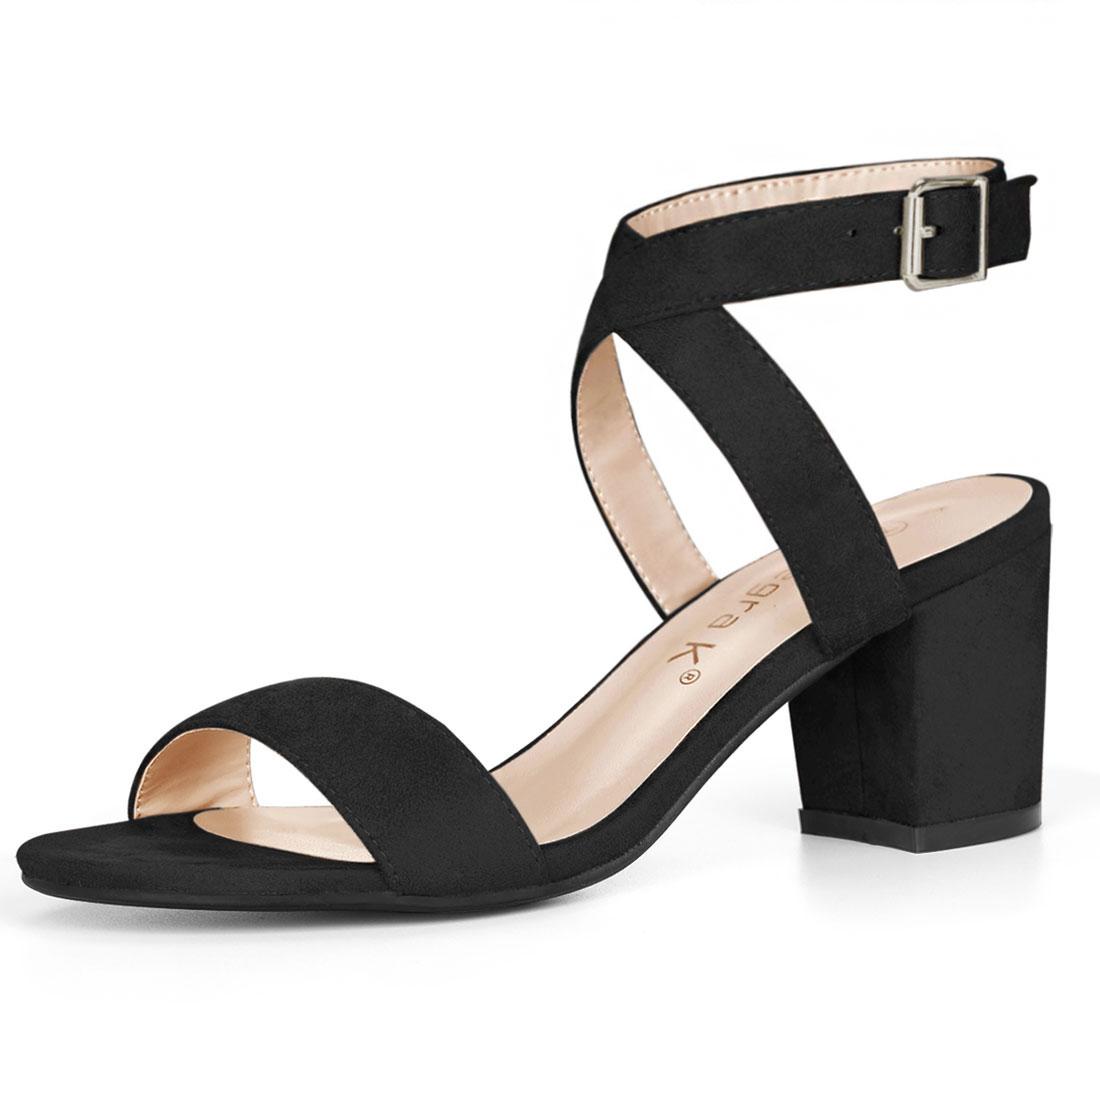 Allegra K Women's Crisscross Mid Block Heel Ankle Strap Sandals Black US 8